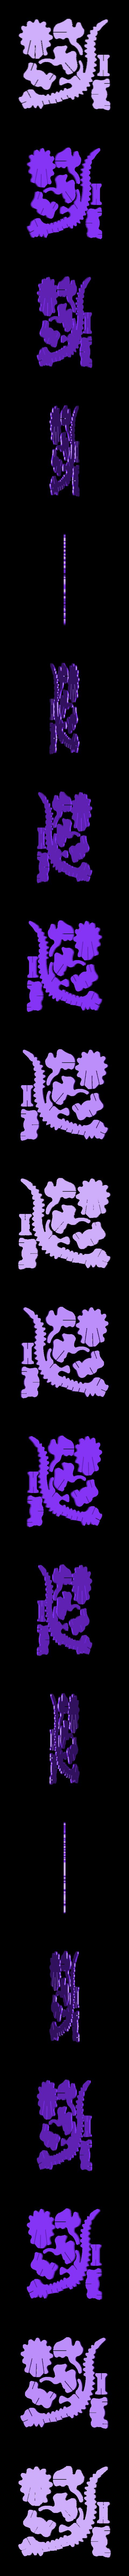 Part 2.stl Download free STL file Triceratops 3D Puzzle Construction Kit • 3D printing template, Alsamen